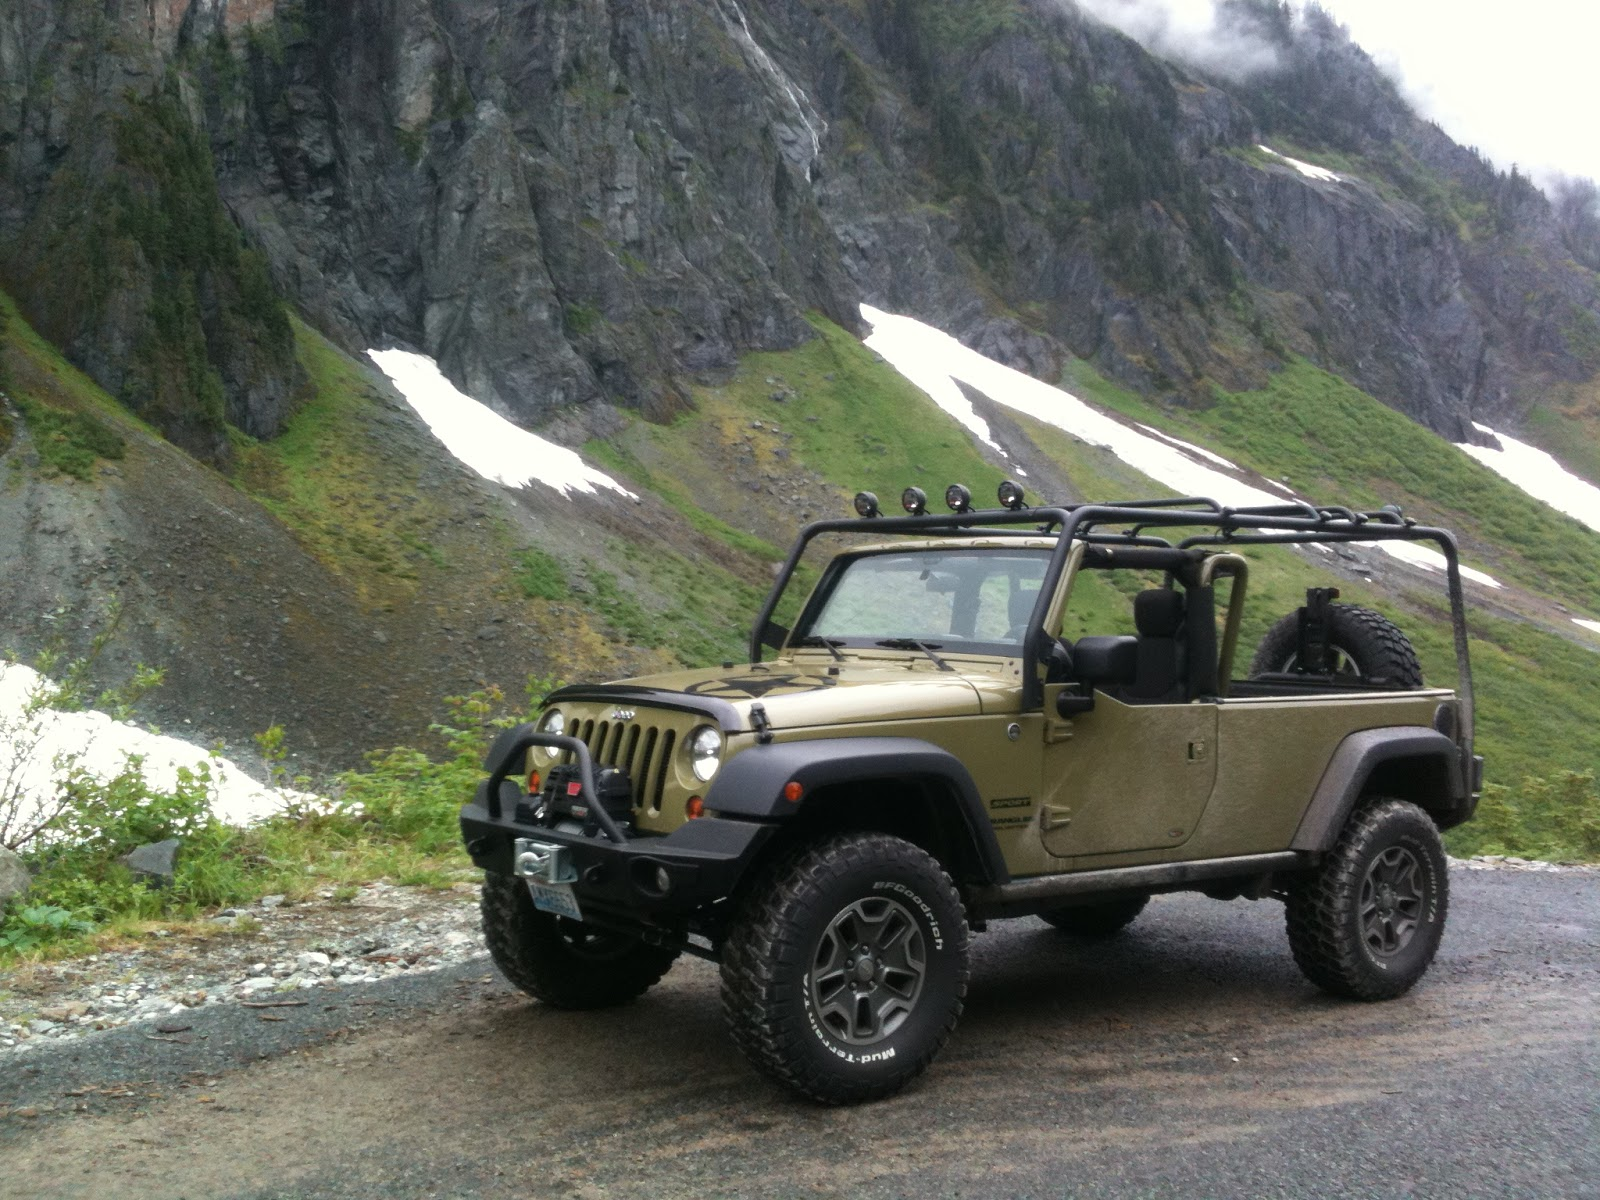 2013 Jeep Wrangler JK8 Conversion